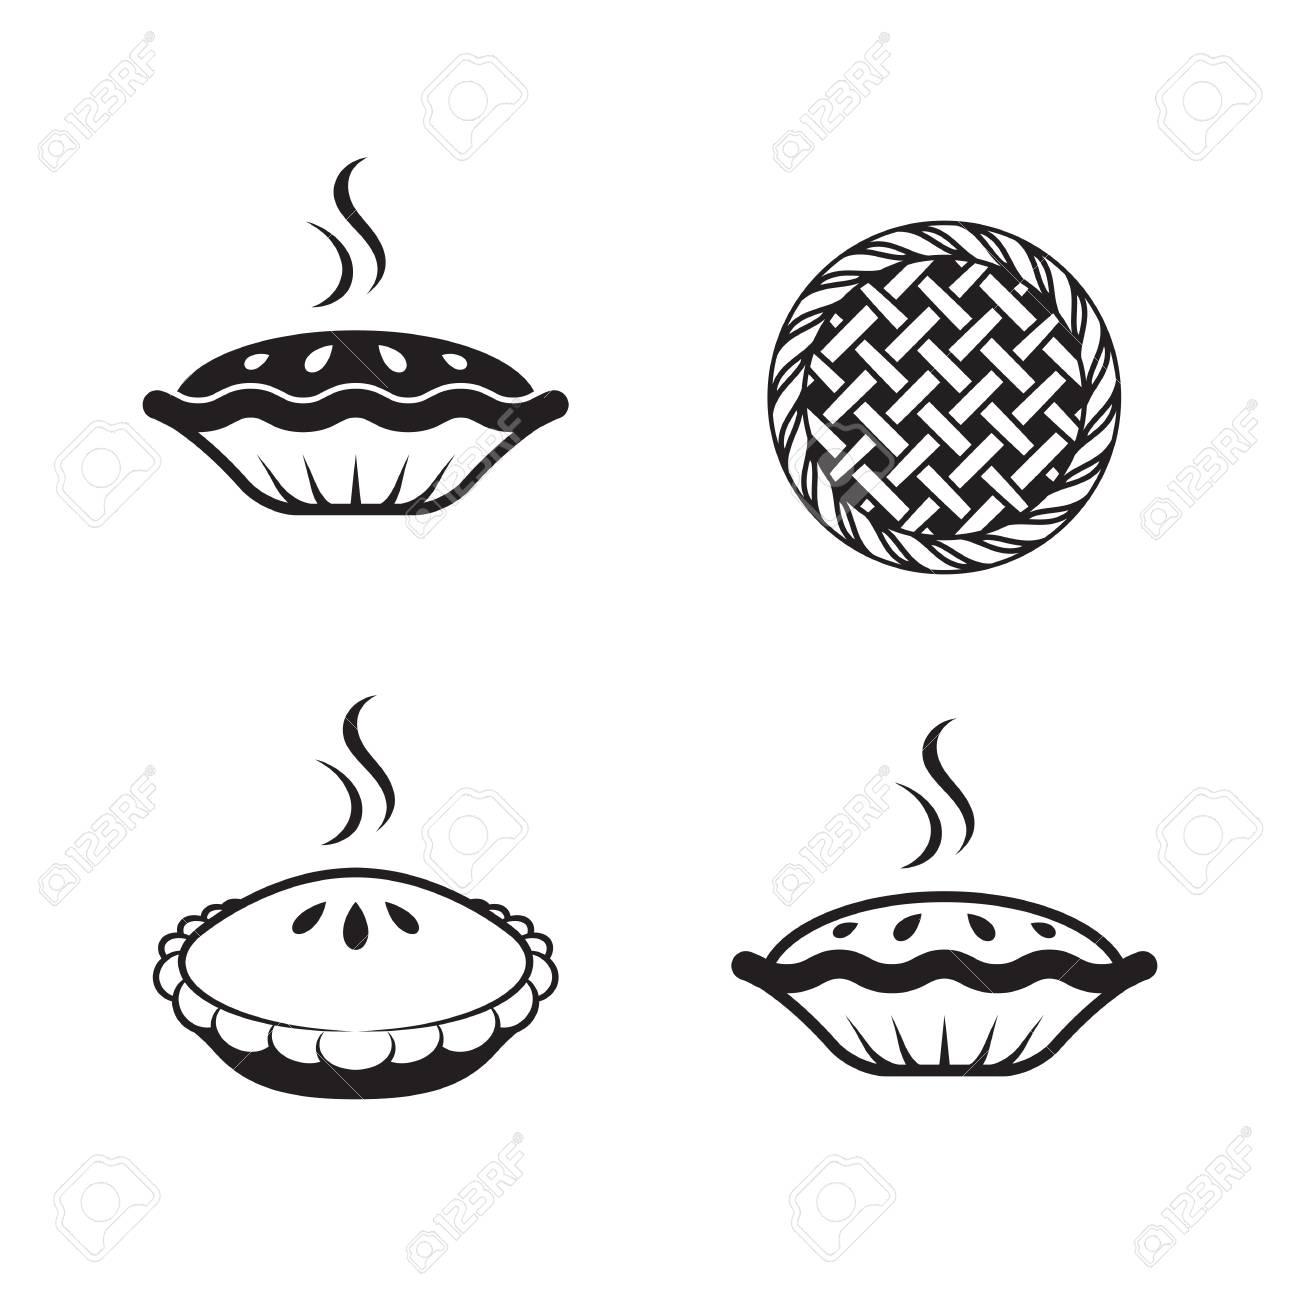 pie icons set. Black on a white background - 84730062